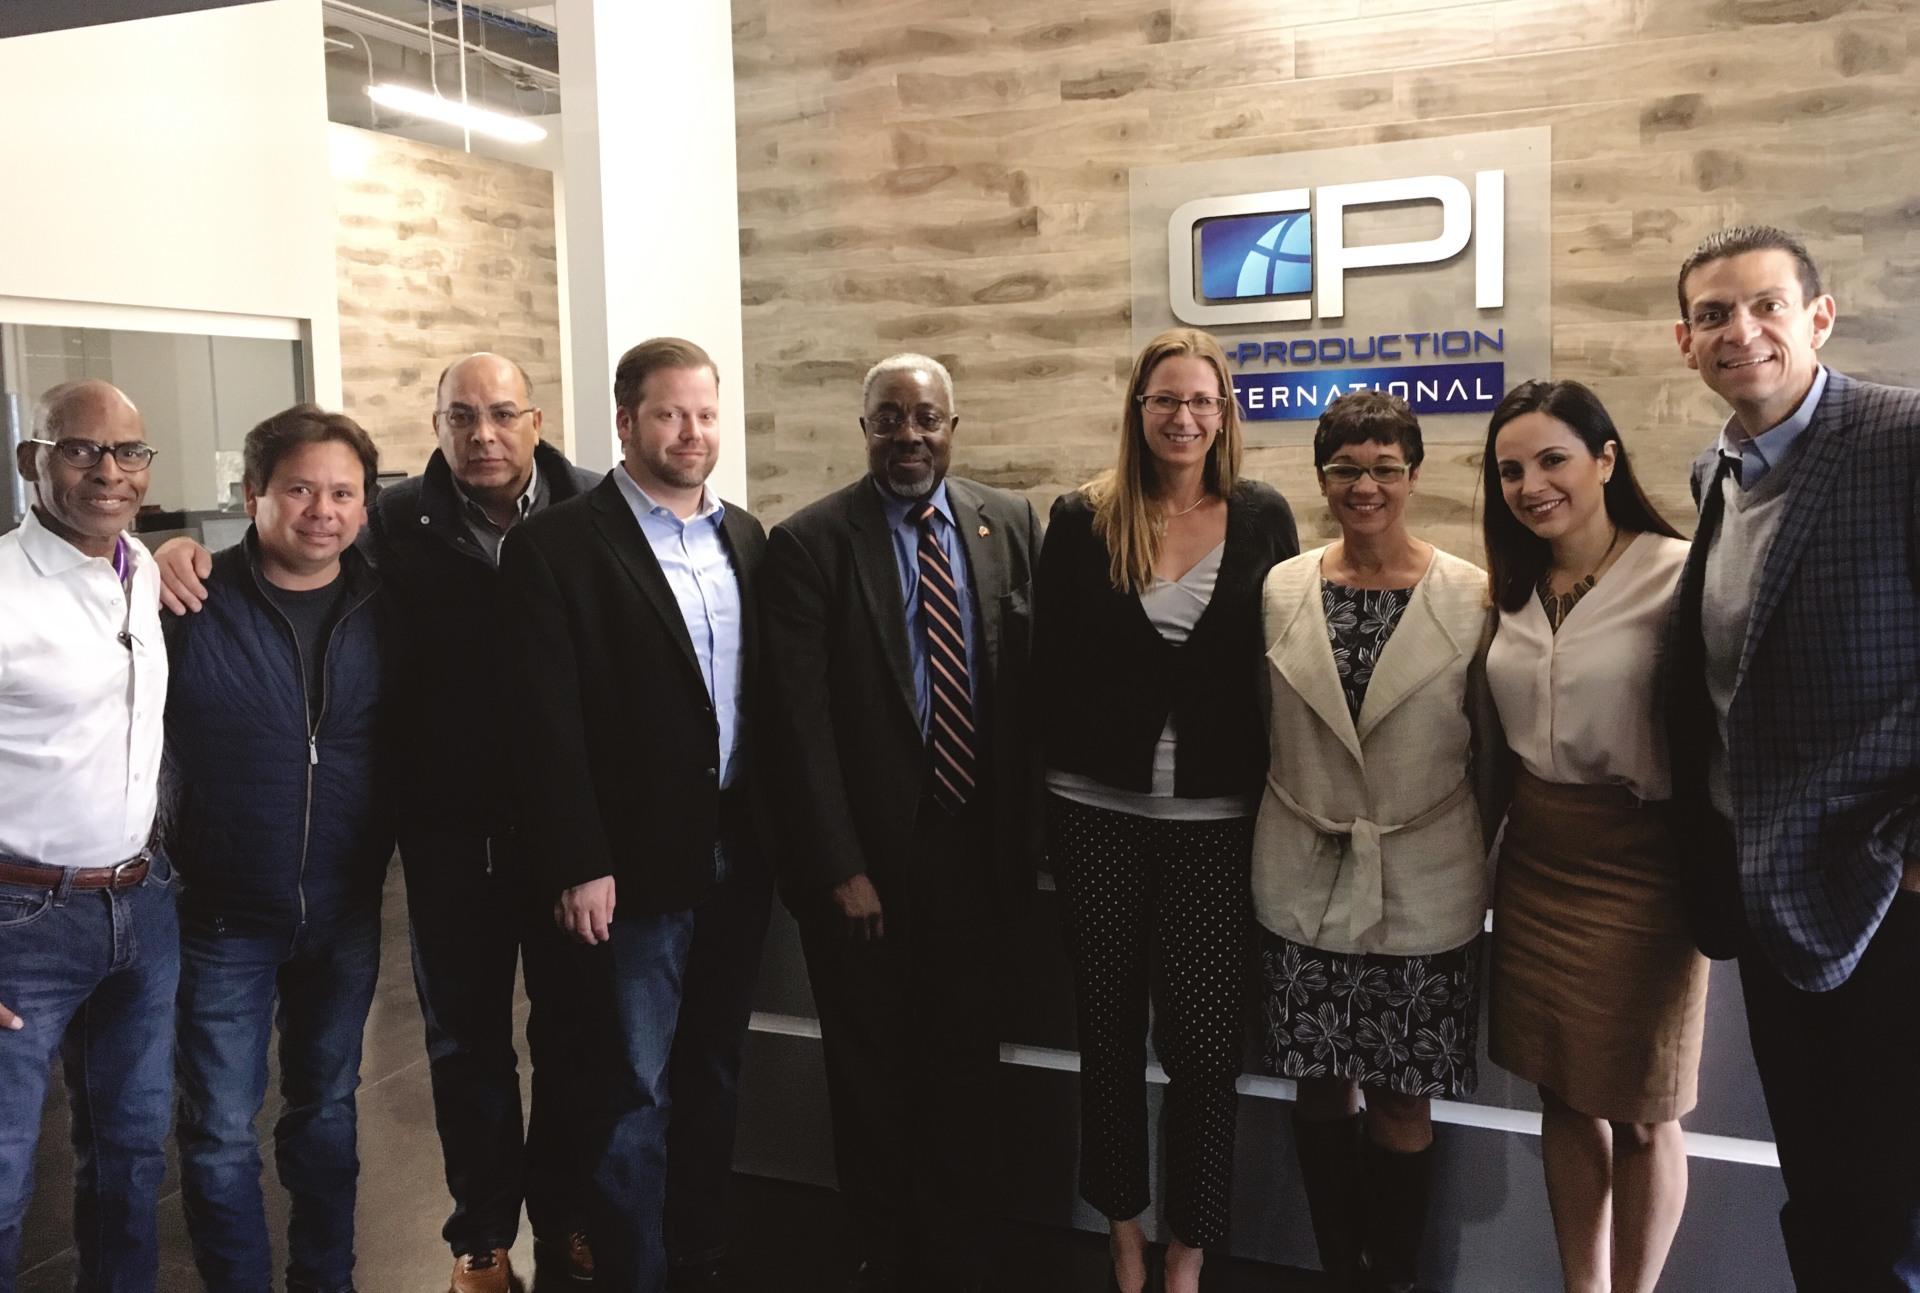 Aerospace Arizona members at Co-Production International